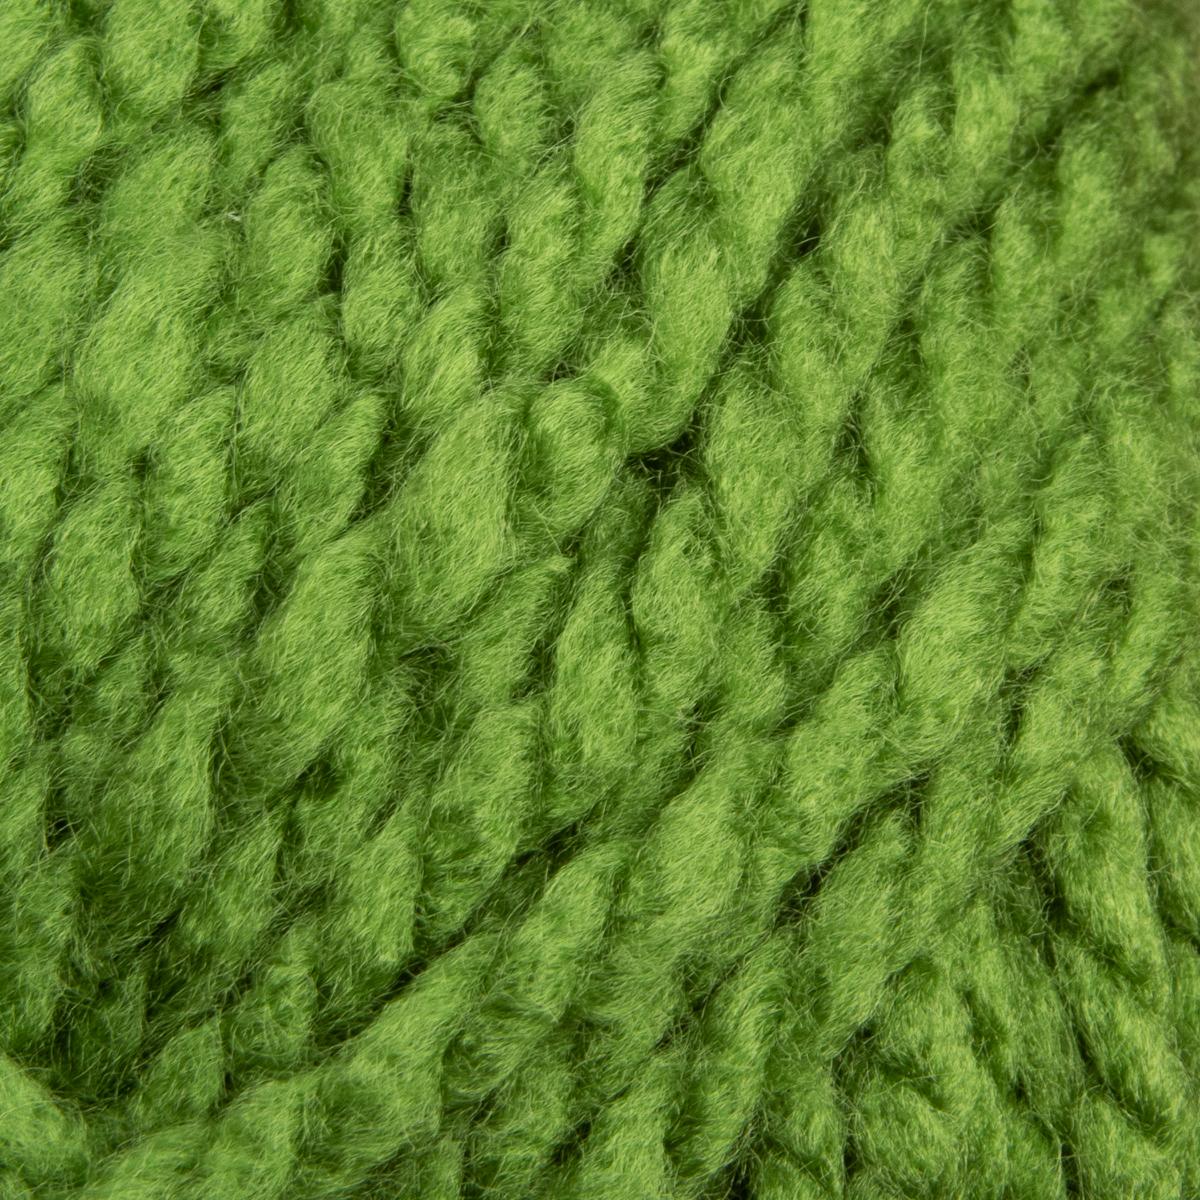 3pk-Premier-Yarns-Deborah-Norville-Serenity-100-Acrylic-Yarn-Chunky-5-Knitting thumbnail 60